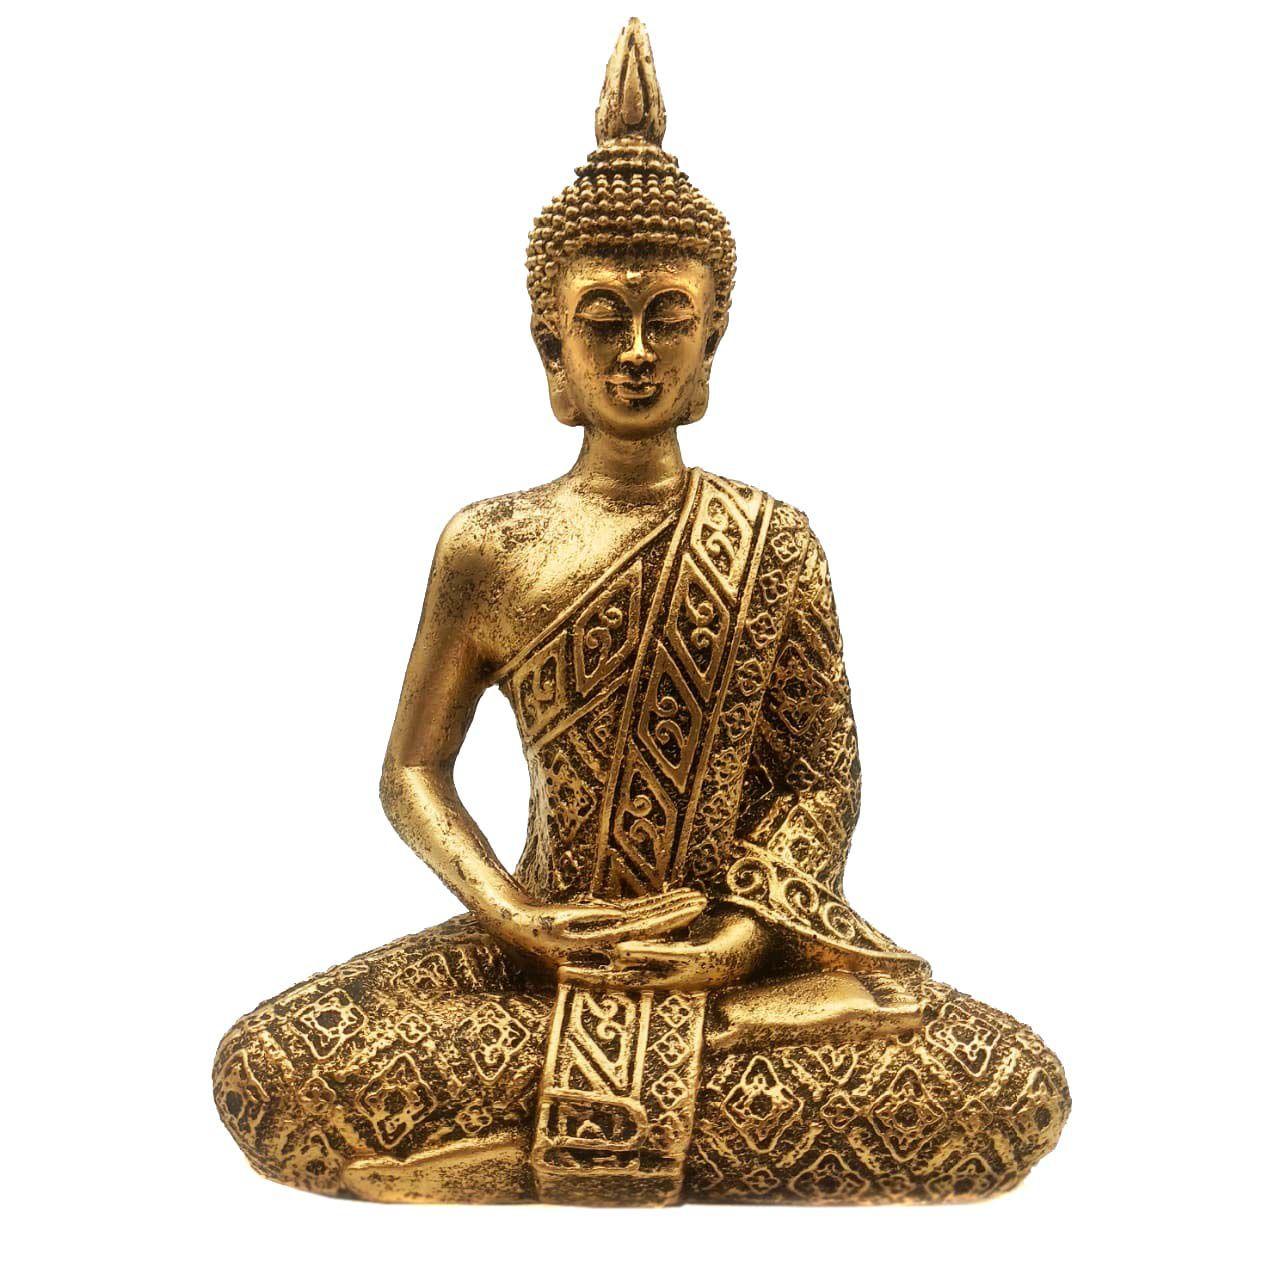 Estátua de Buda Hindu Resina Dourado 19,5cm